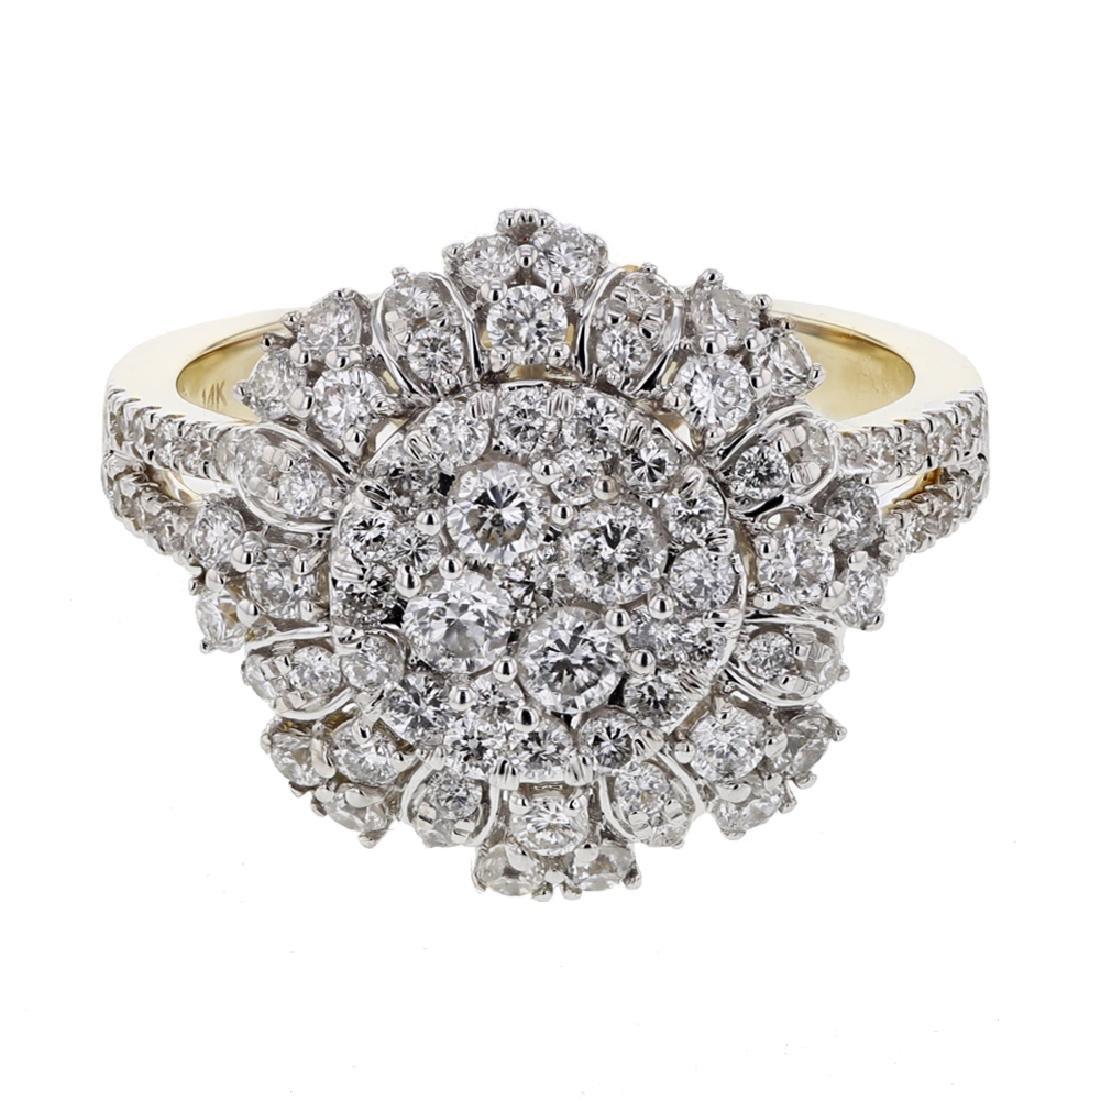 1.32 CTW Diamond Cluster Ring 14K Yellow Gold -